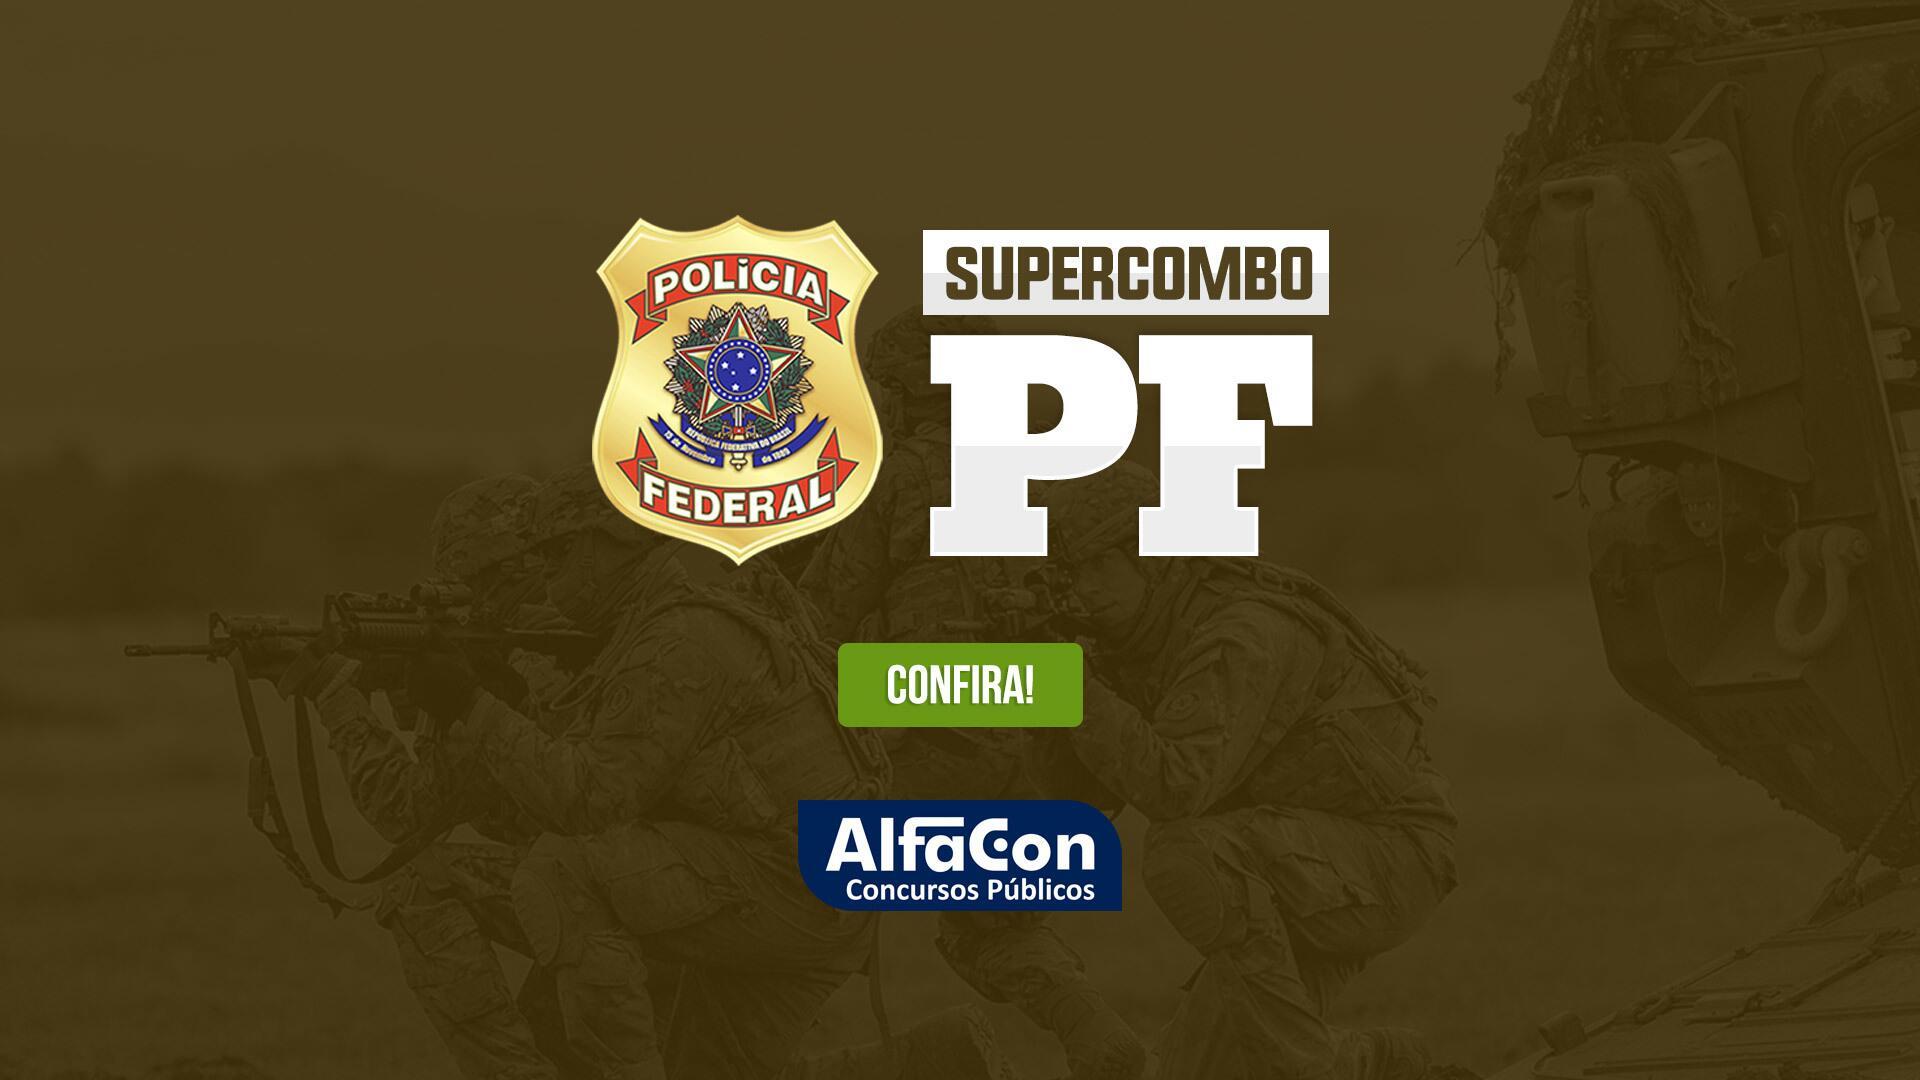 Supercombo PF - Agente da Polícia Federal